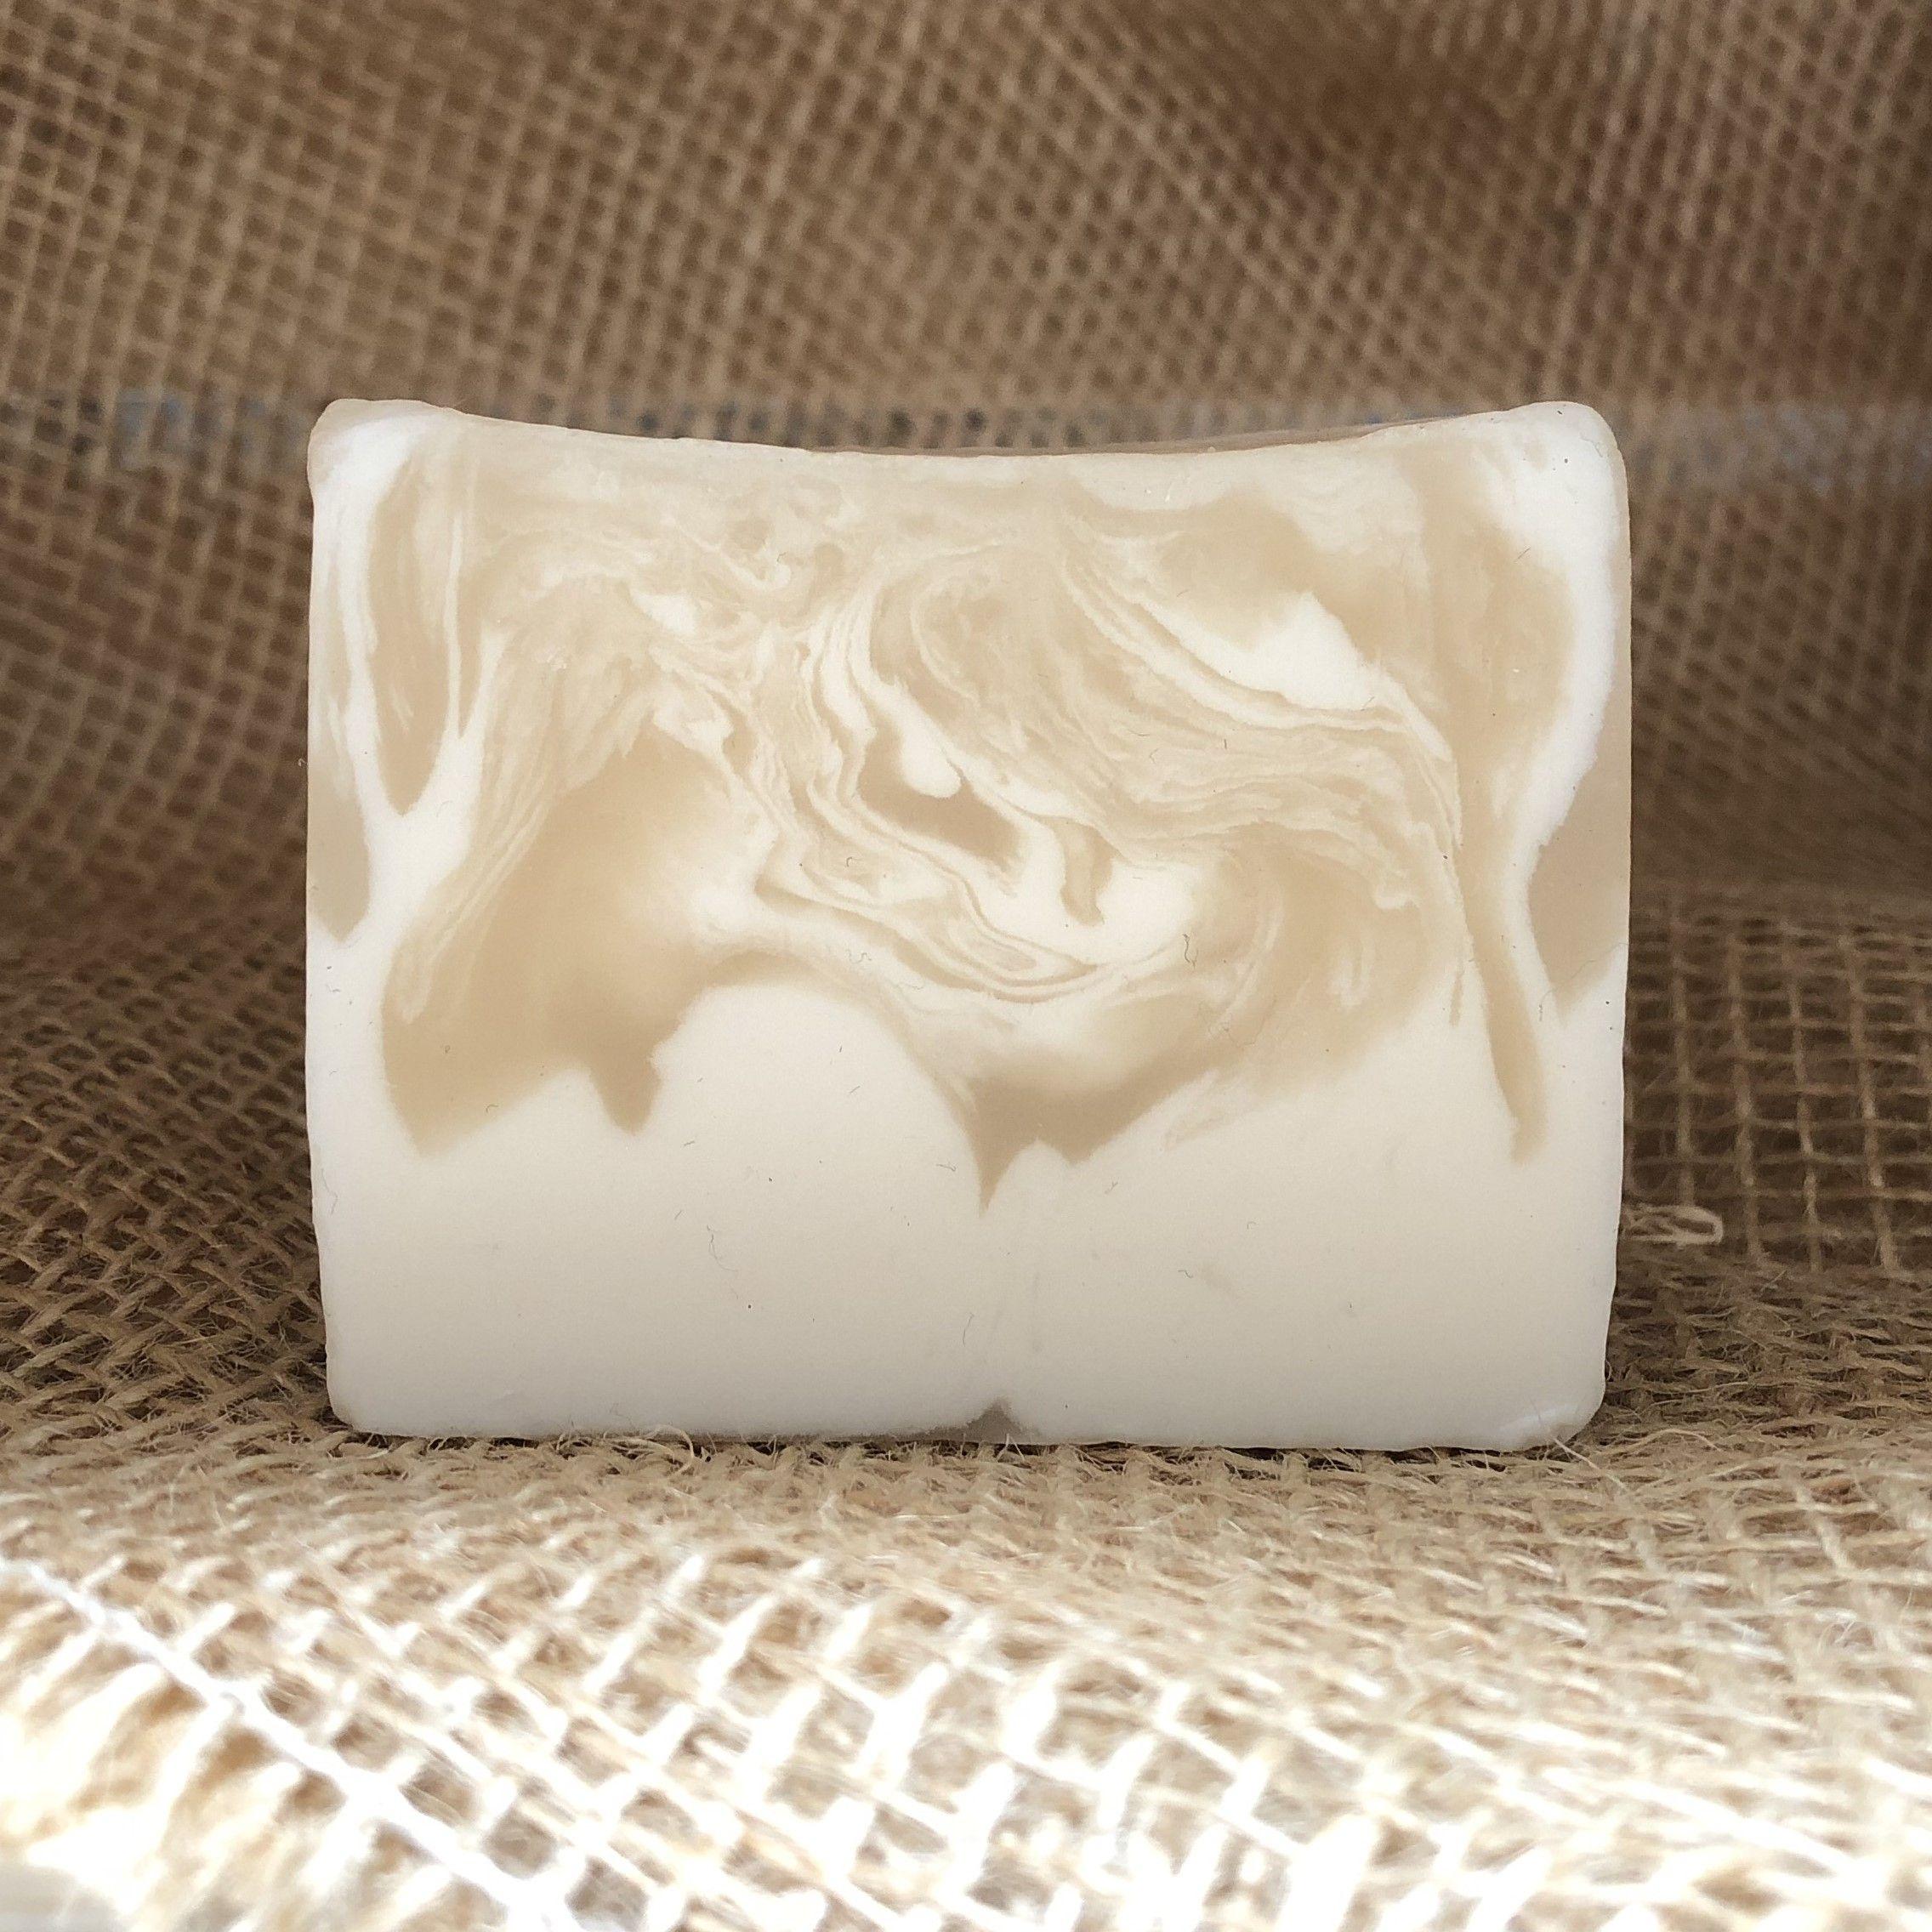 Soap - Large Goat Milk